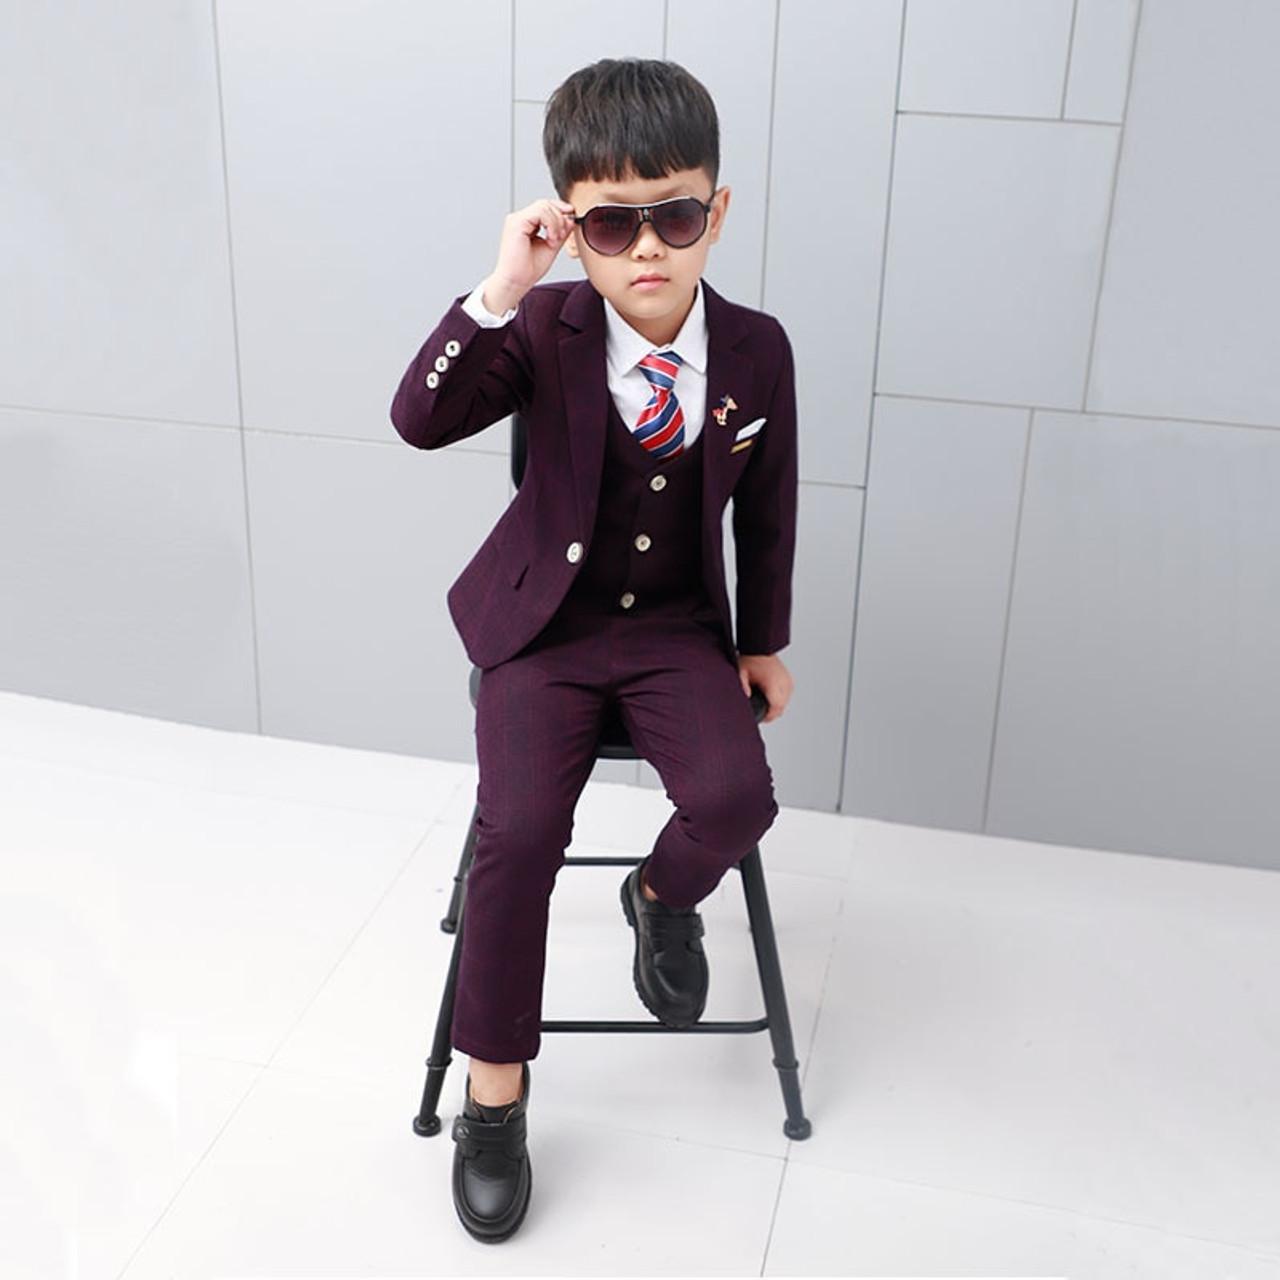 c85916c12271 ActhInK New Boys Winter Suit 5Pcs Kids Wedding Blazer Suit Boys ...